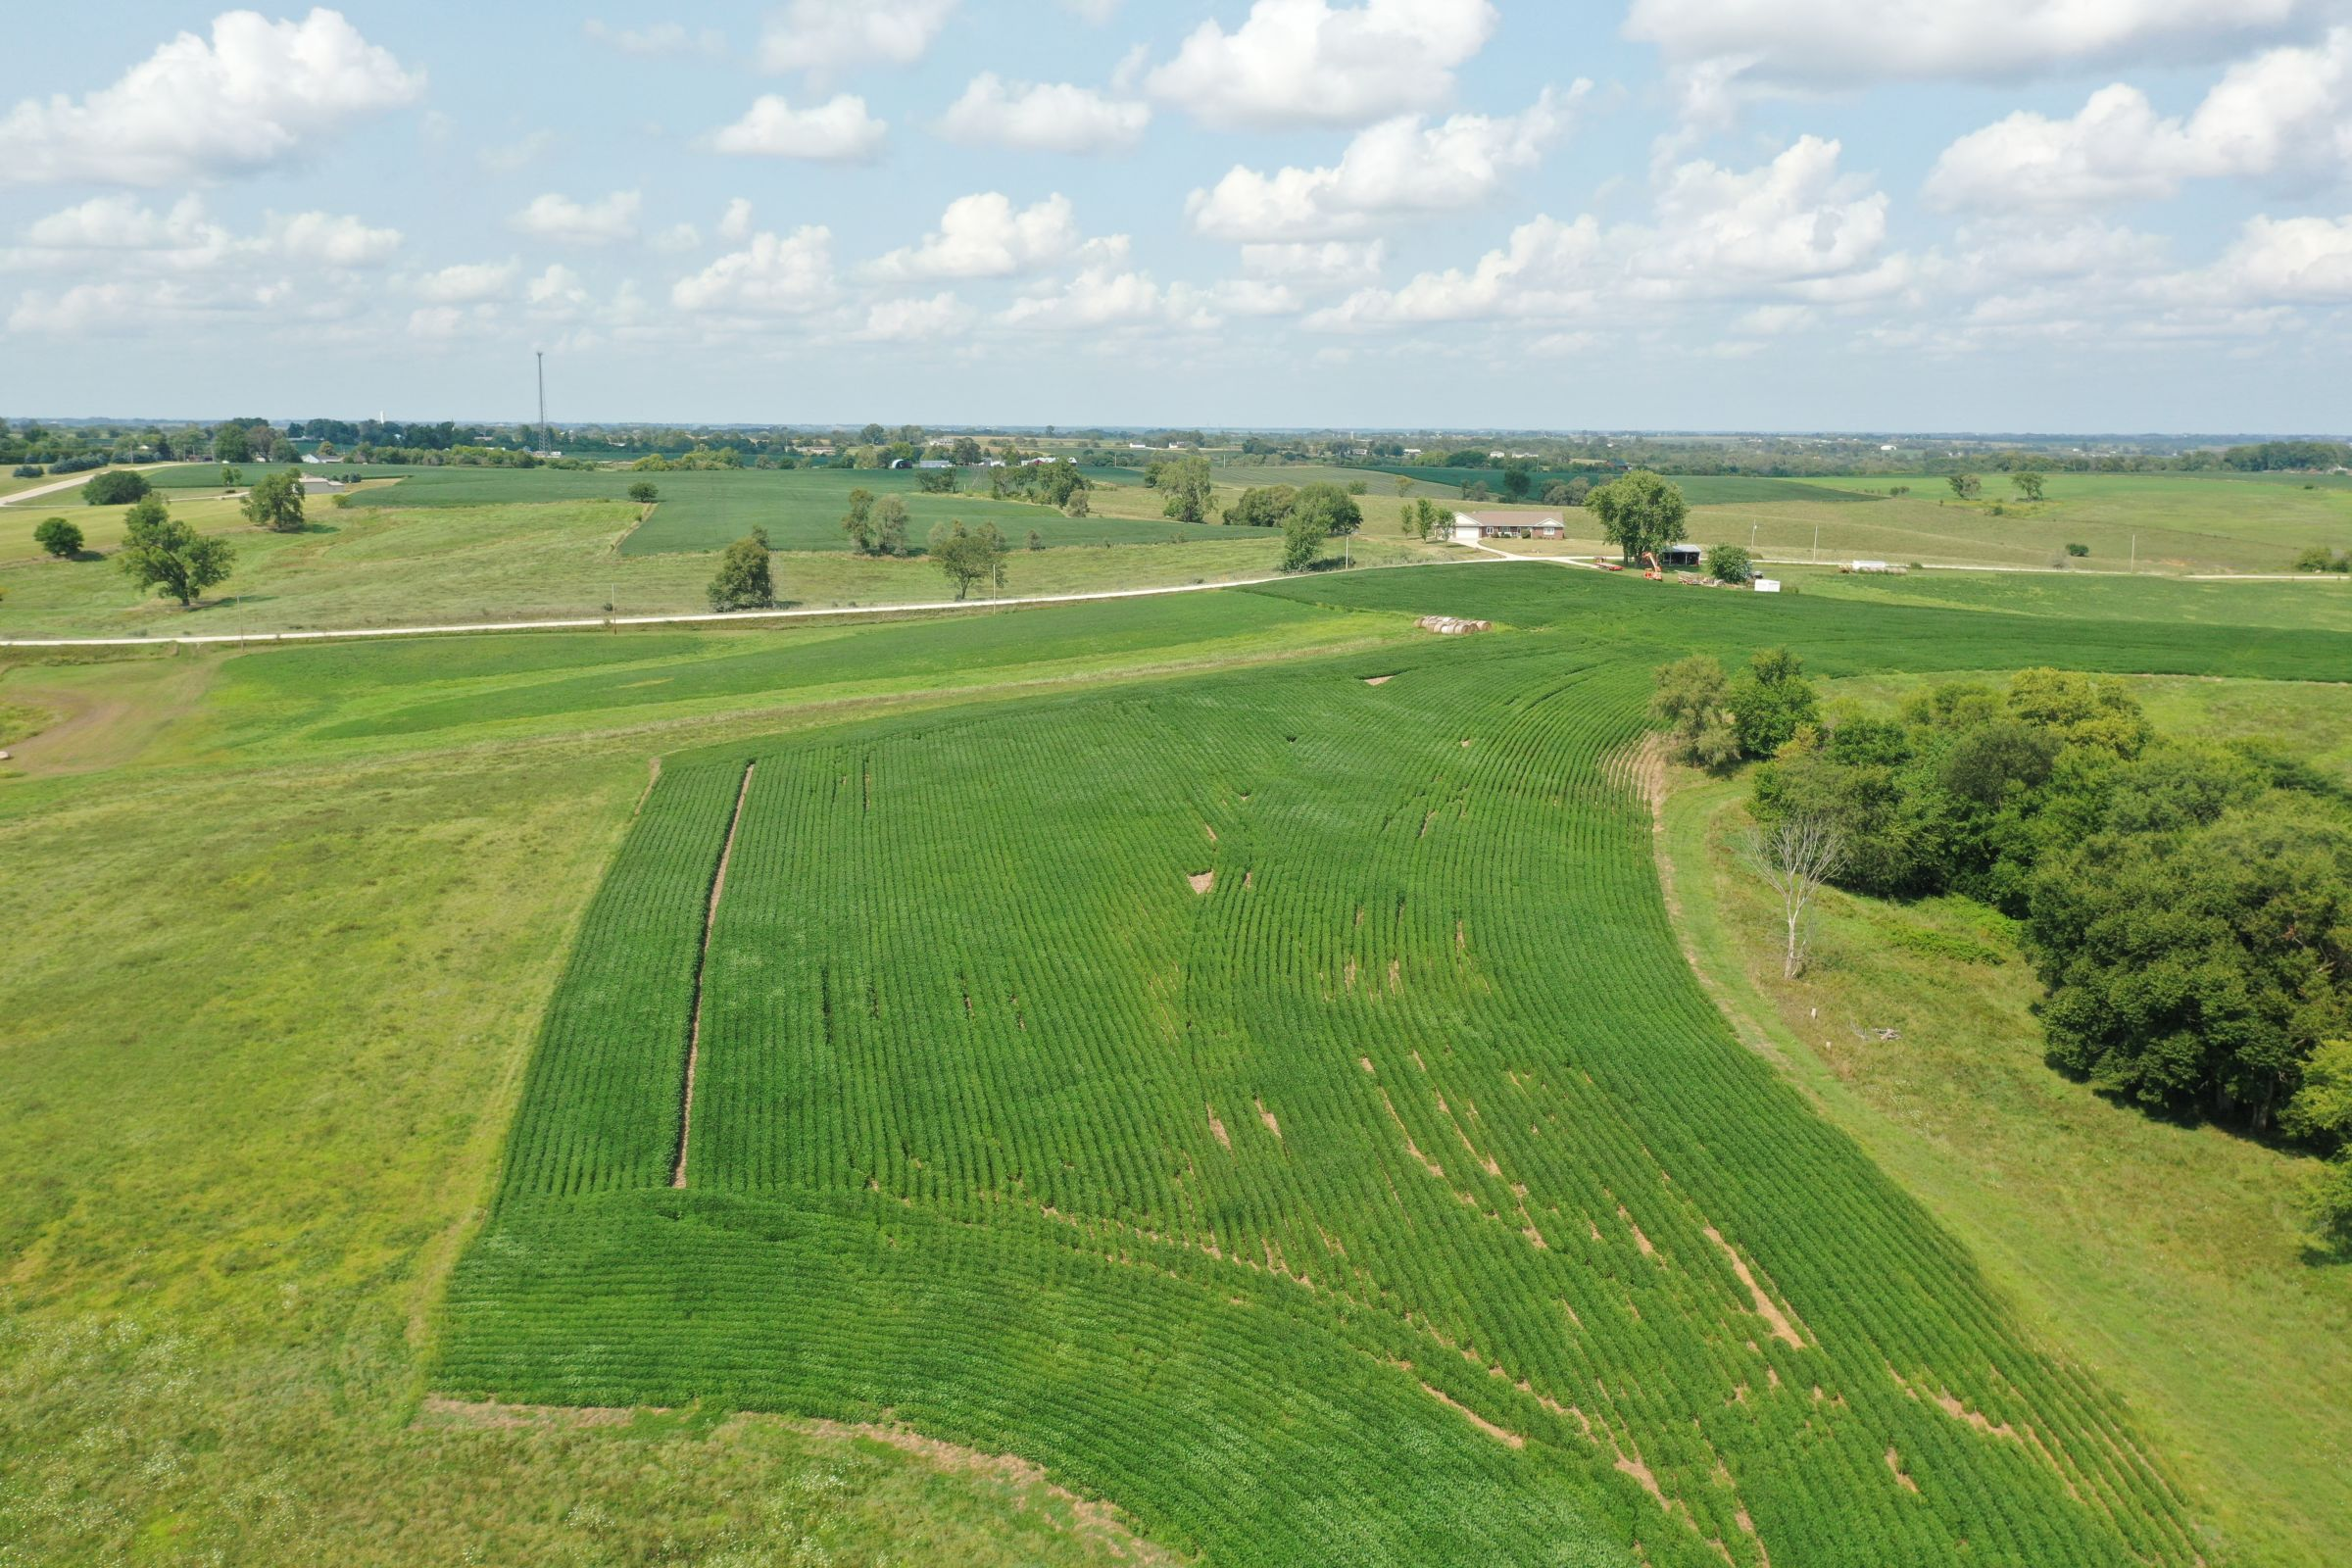 land-warren-county-iowa-12-acres-listing-number-15694-0-2021-08-20-170720.JPG